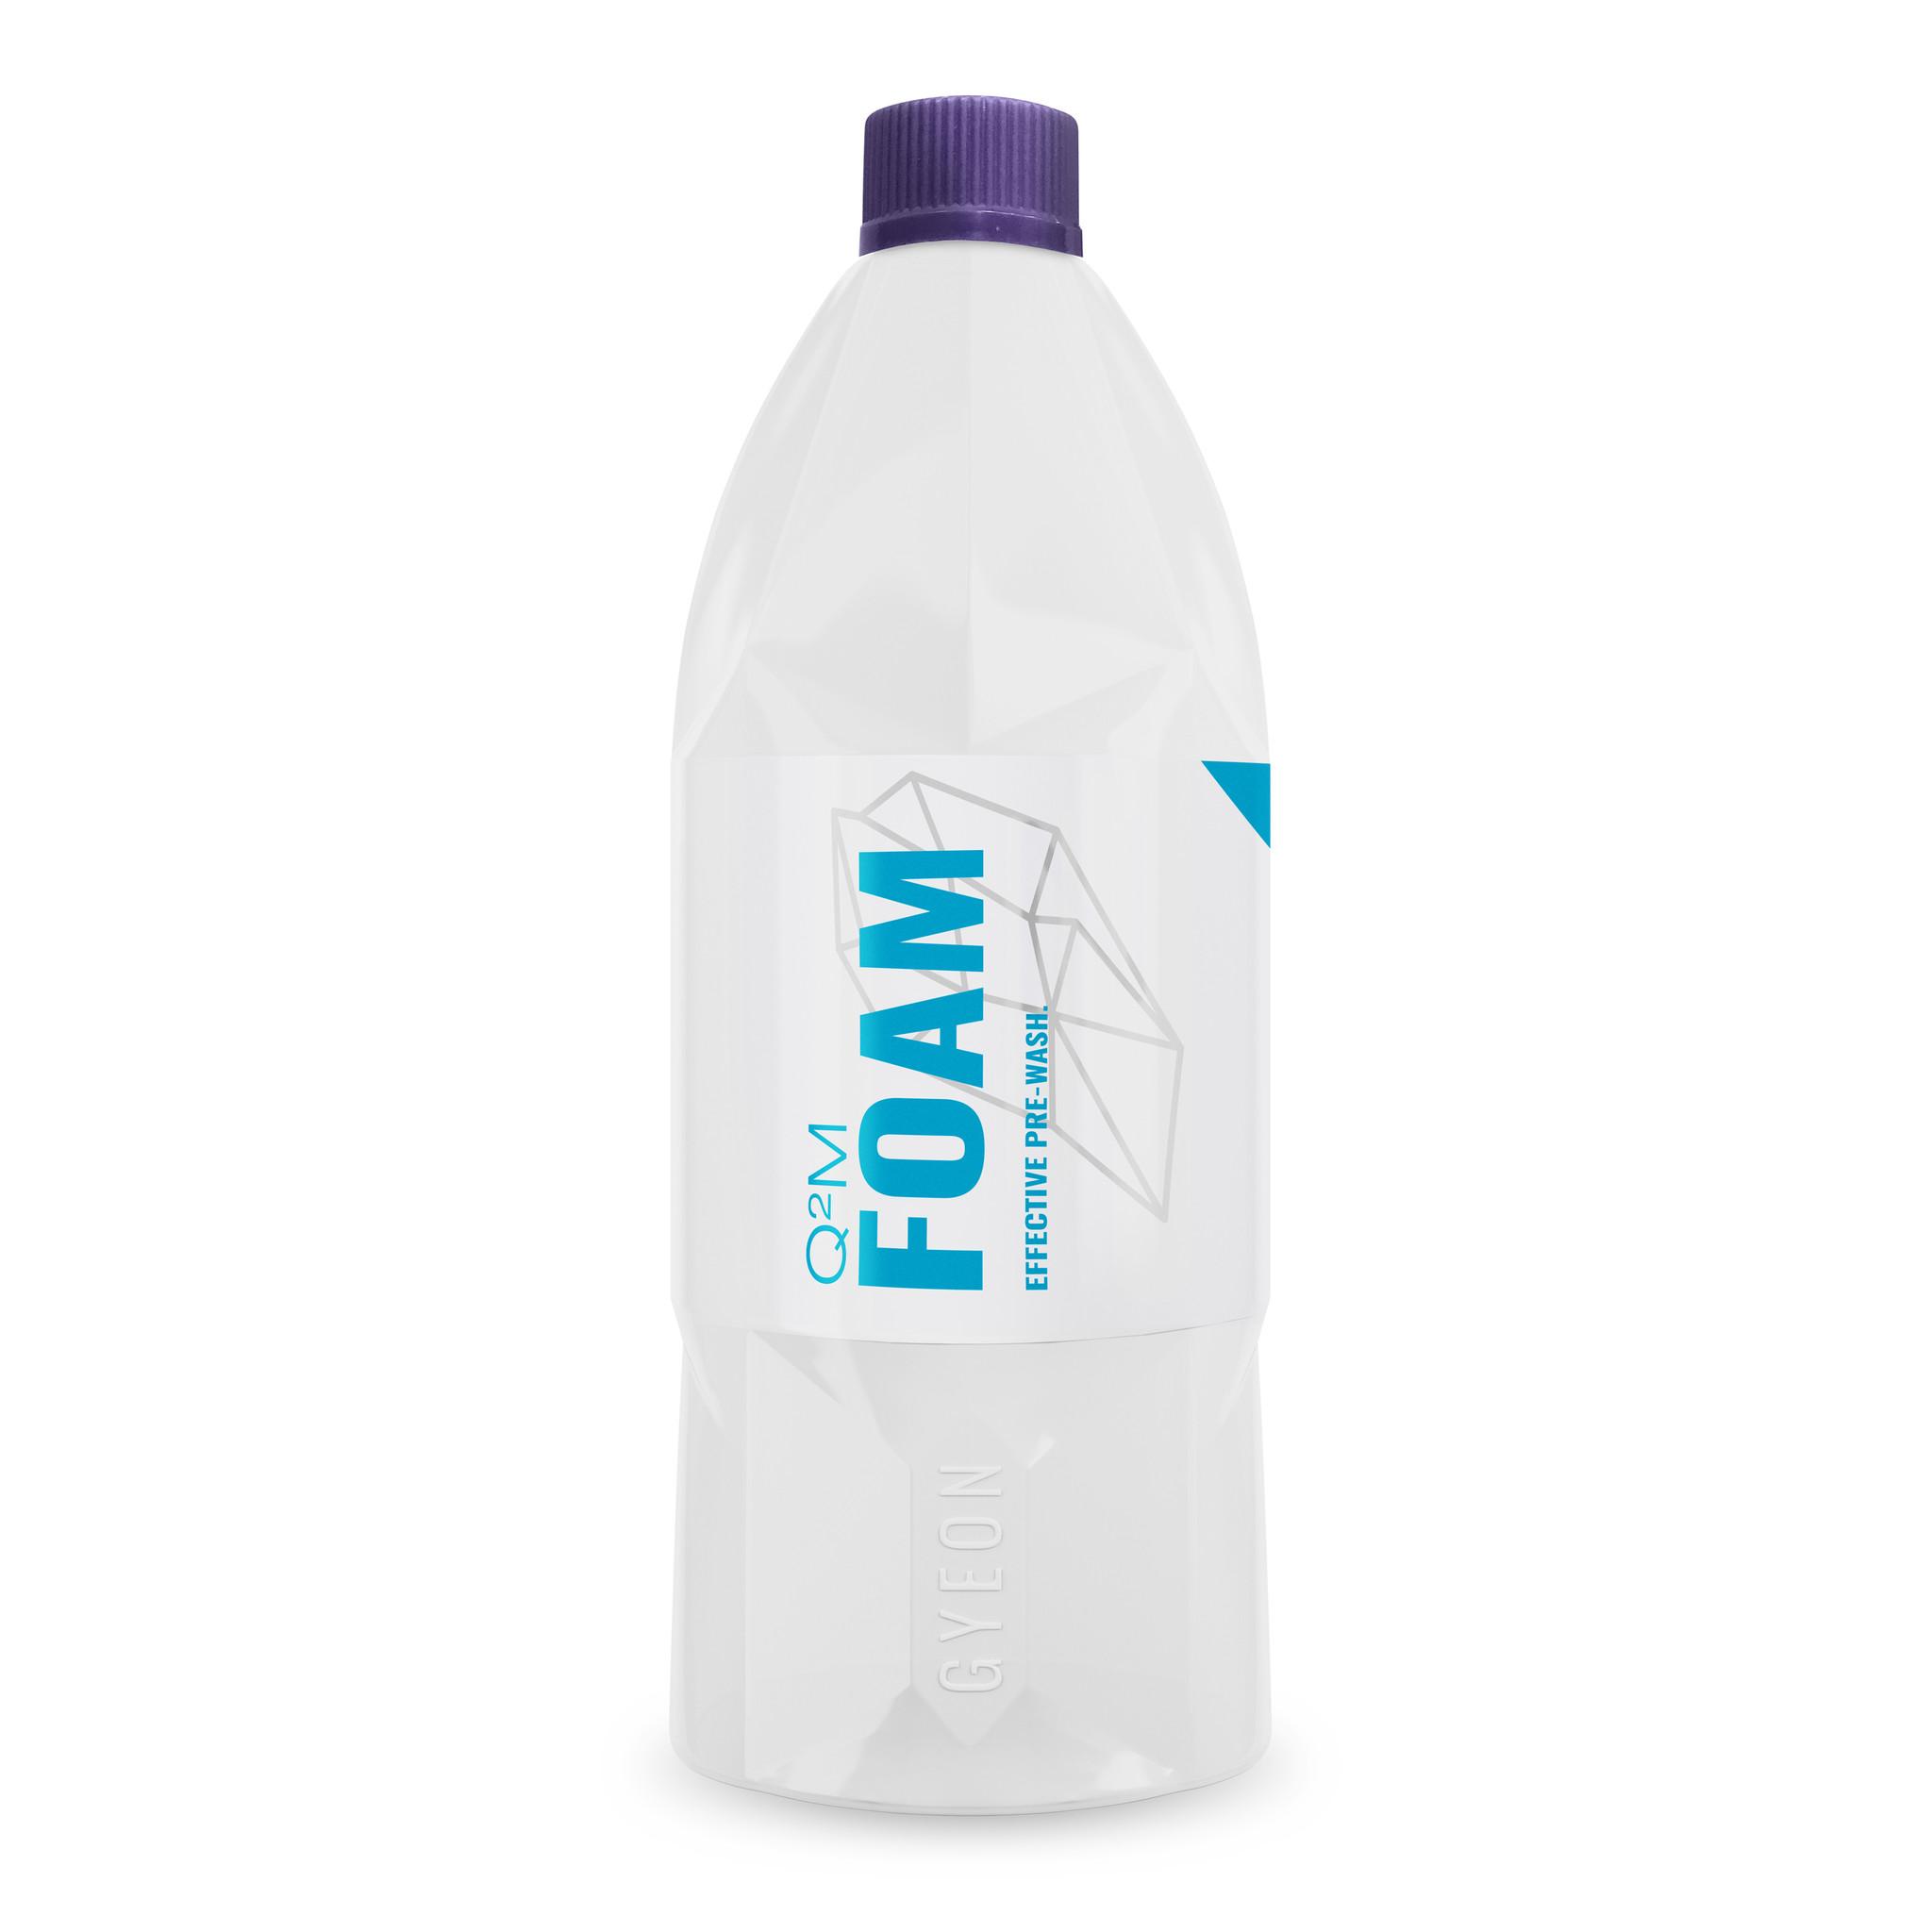 Gyeon Gyeon Q2M Foam